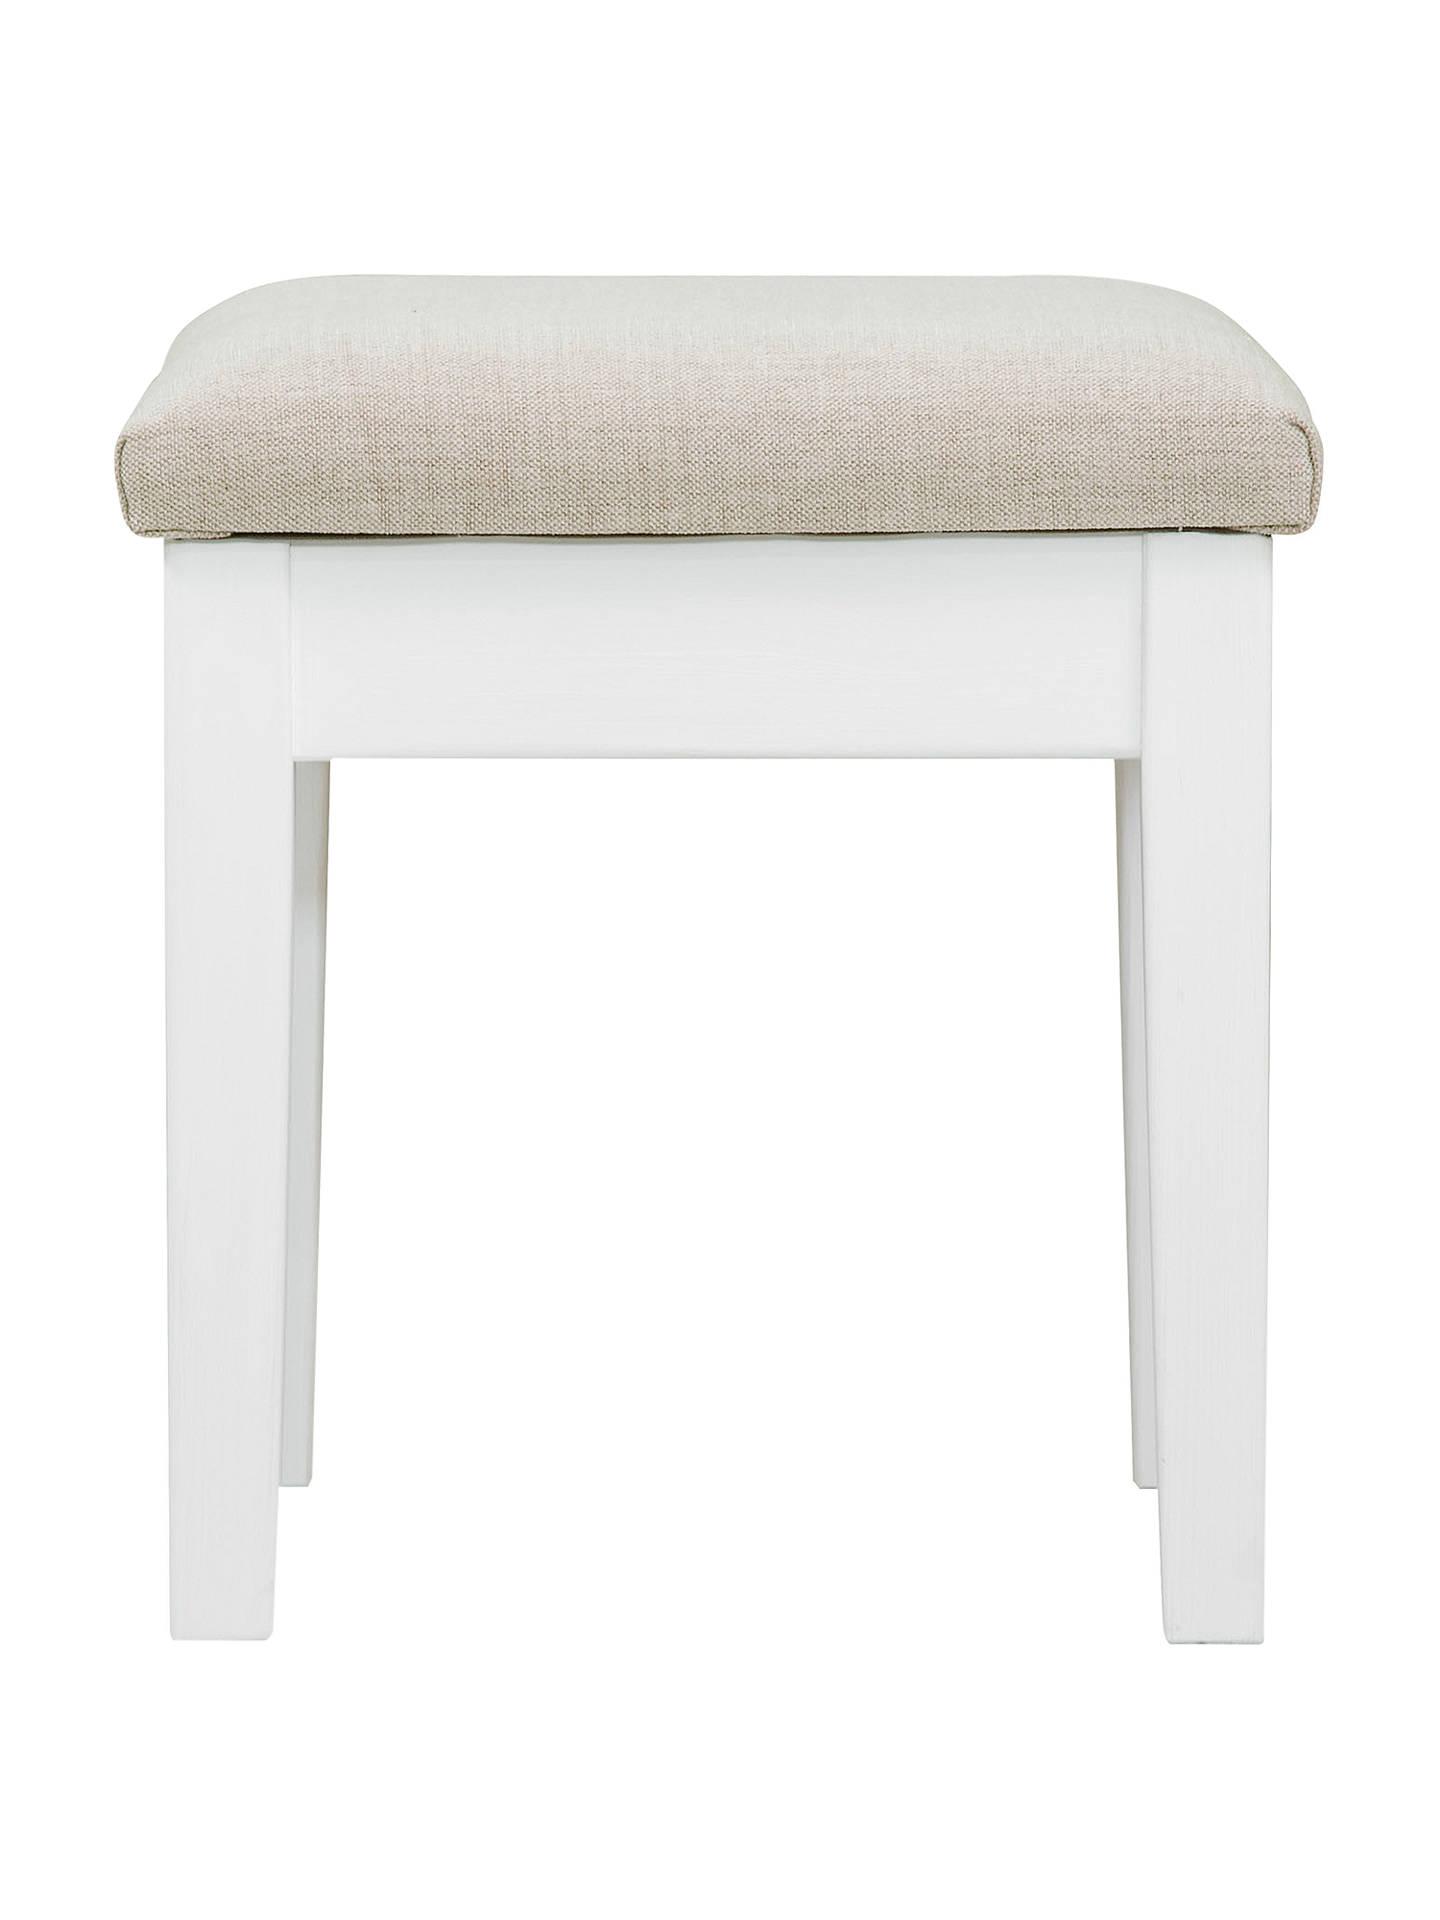 Phenomenal John Lewis Aurelia Dressing Table Stool At John Lewis Partners Ncnpc Chair Design For Home Ncnpcorg